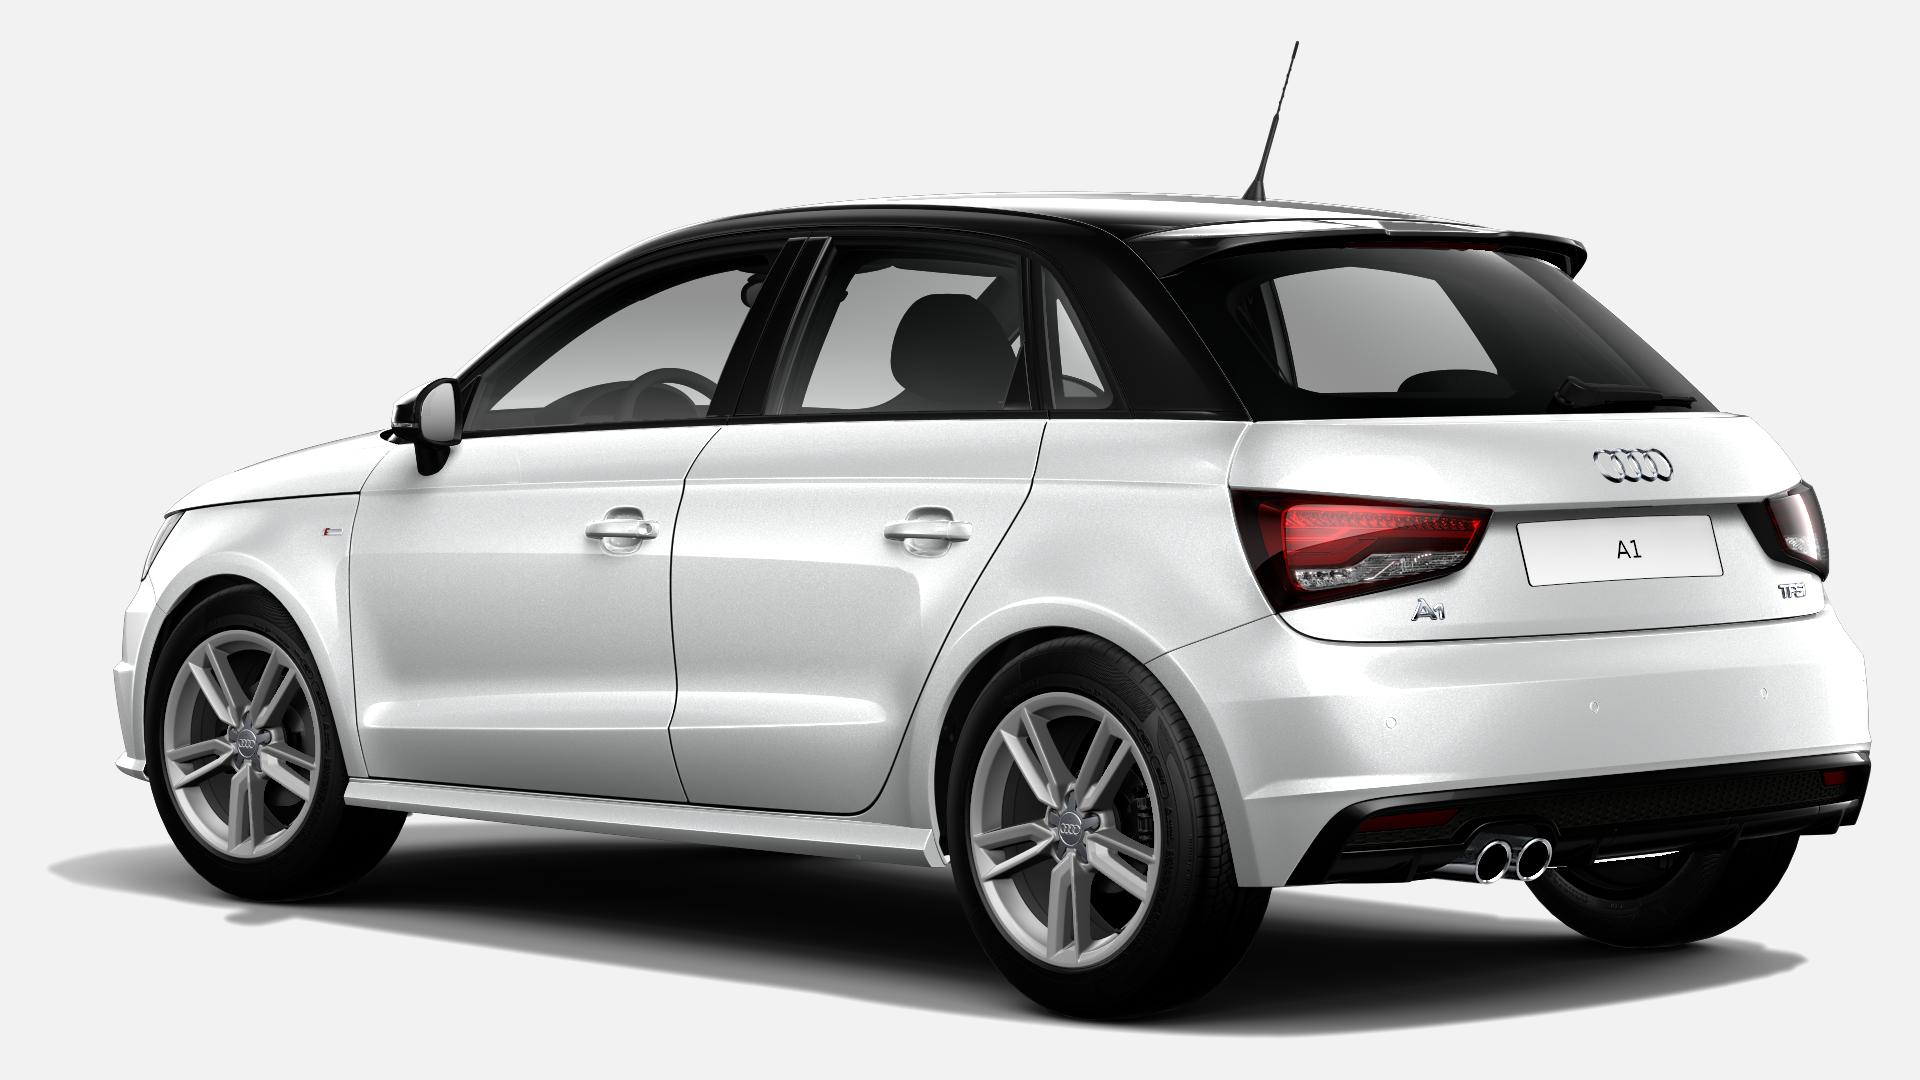 Foto 1 de Audi A1 Sportback 1.4 TFSI Adrenalin 92 kW (125 CV)